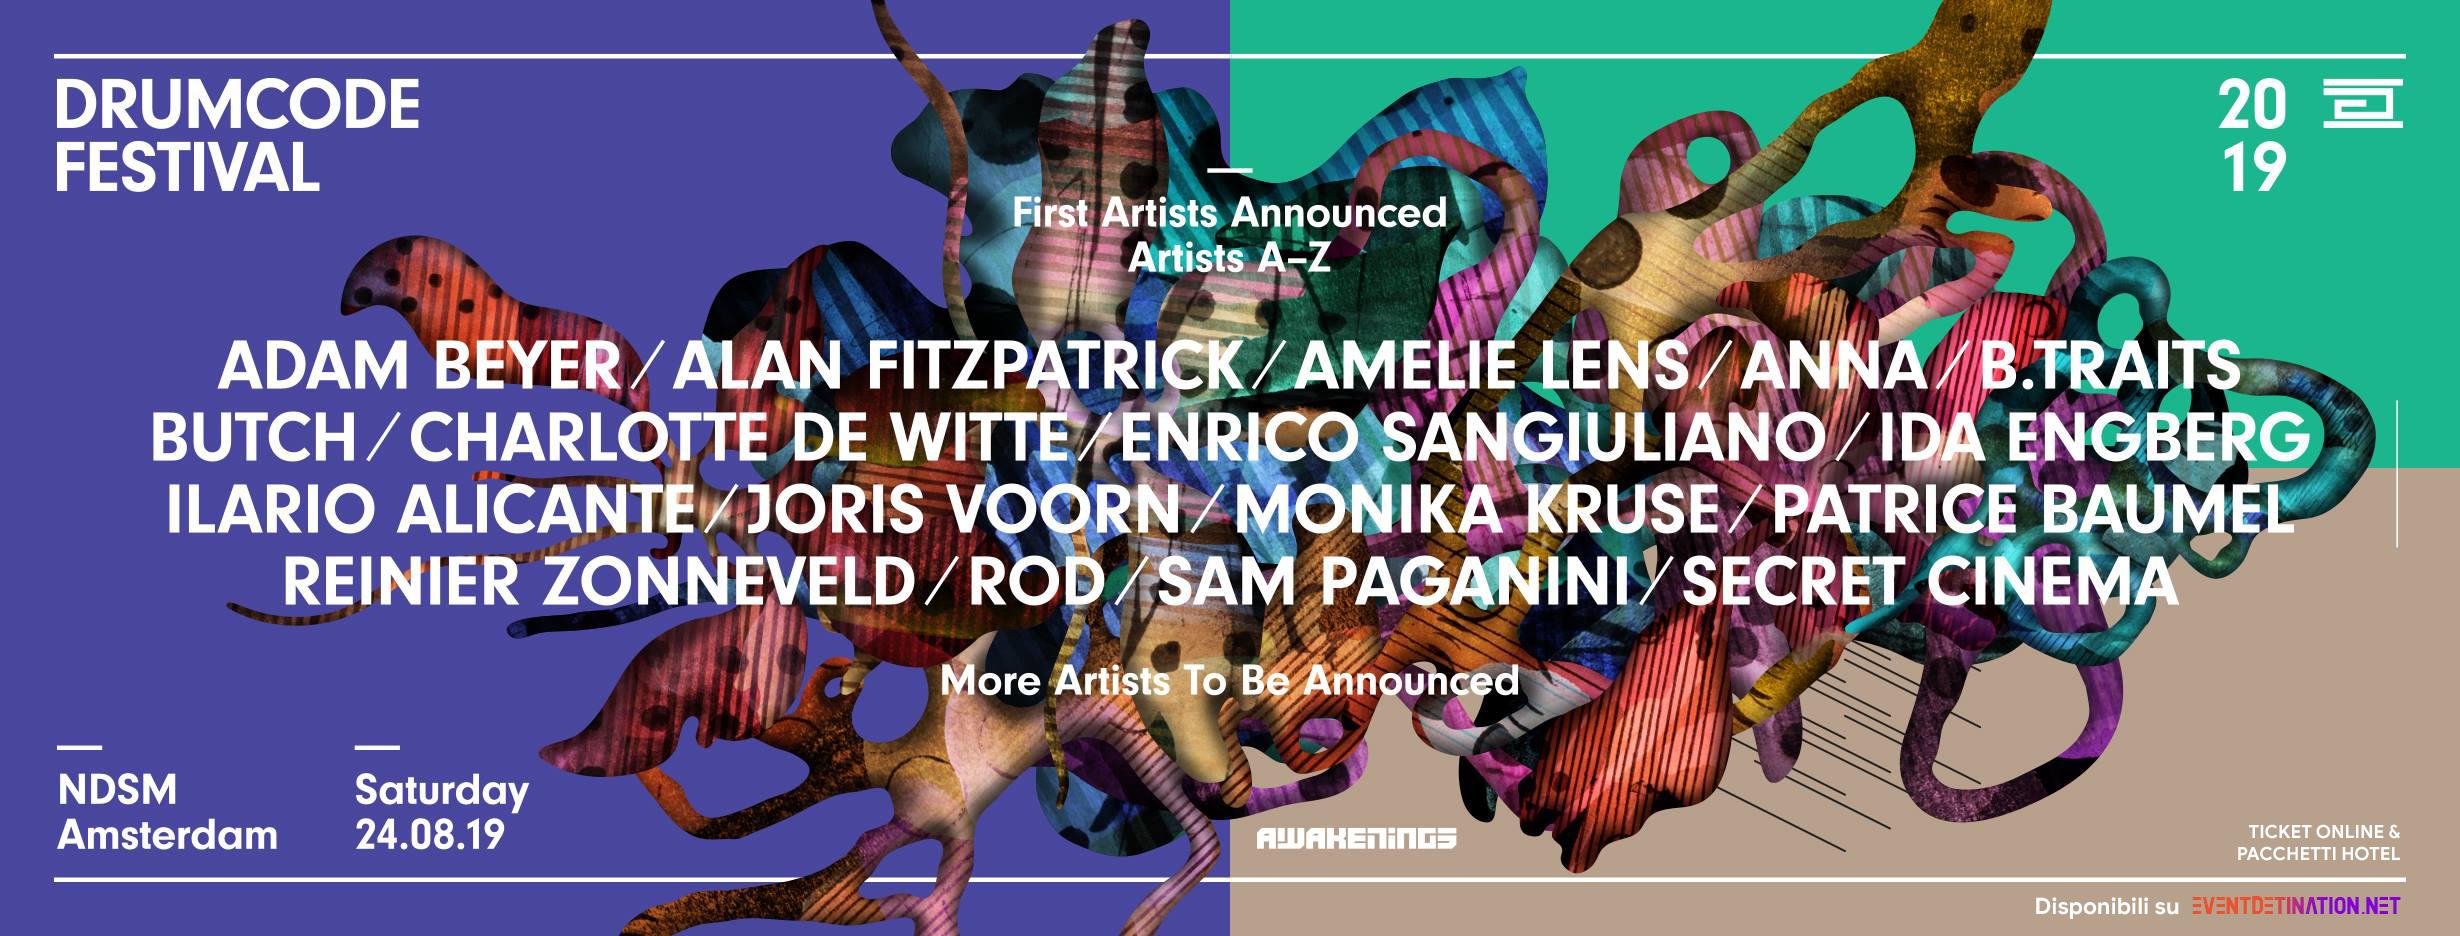 Drumcode Festival 2019, 24 Agosto NDSM Amsterdam – Ticket Pacchetti Hotel